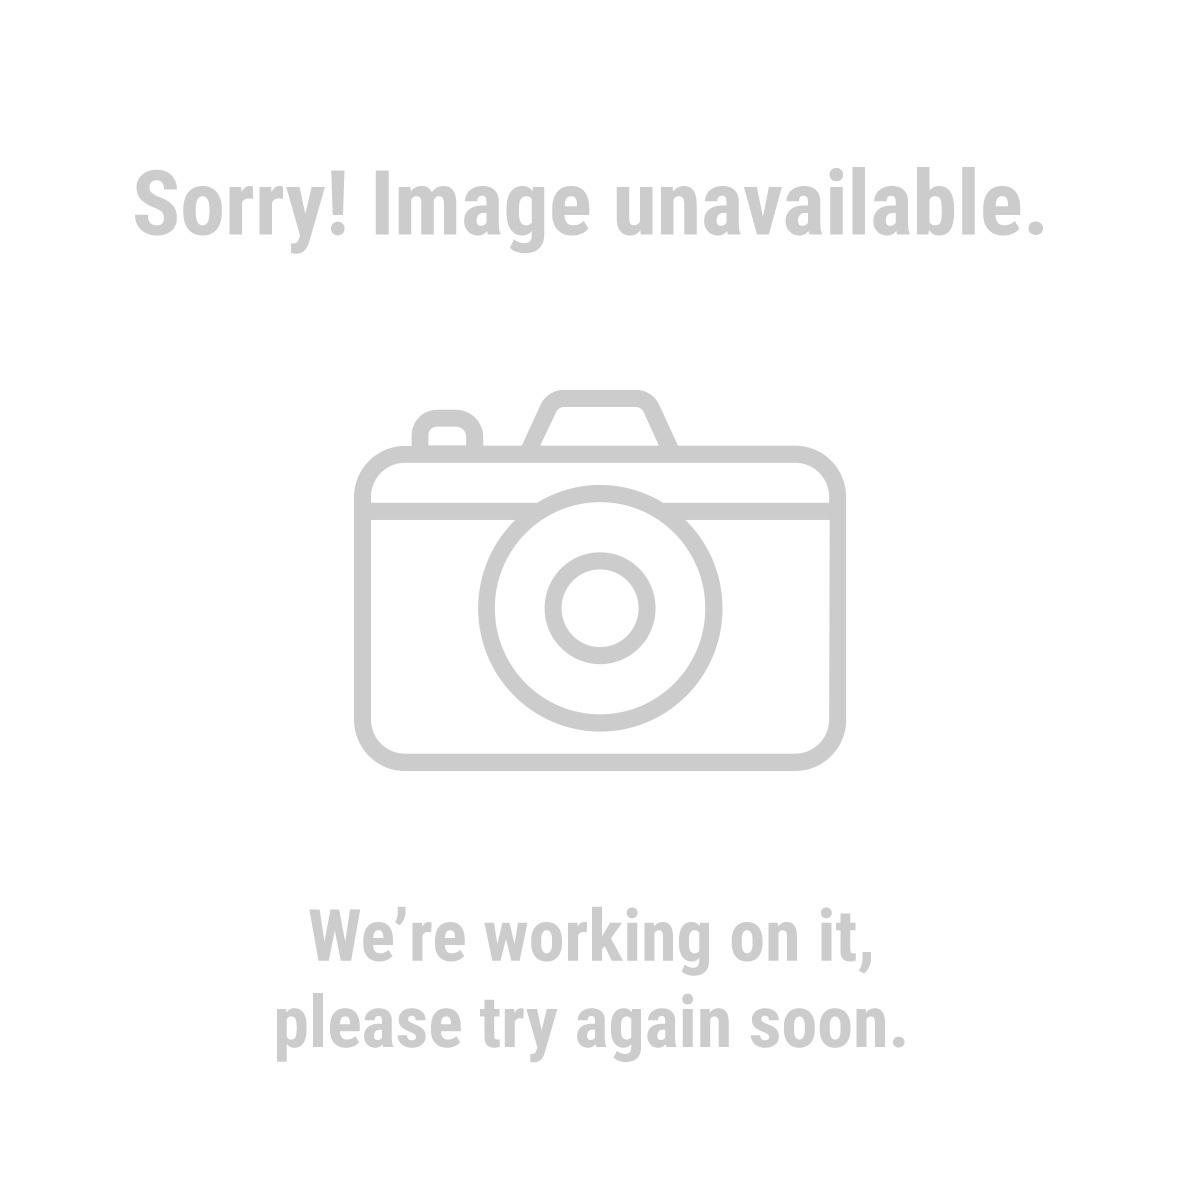 Haul-Master® 62848 1/4 in. x 100 ft. Polypropylene Rope